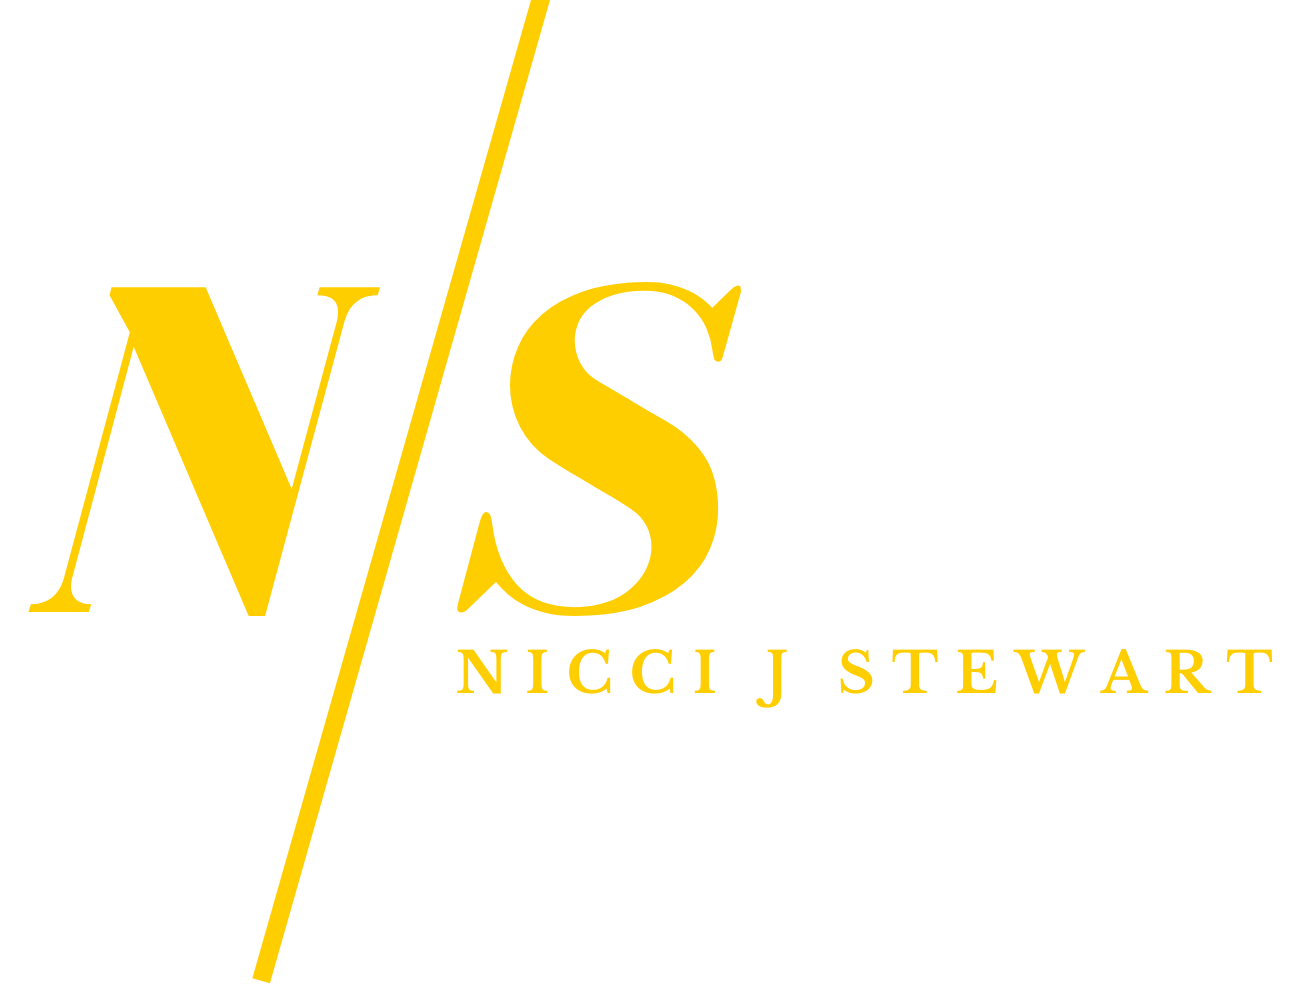 Nicci J Stewart